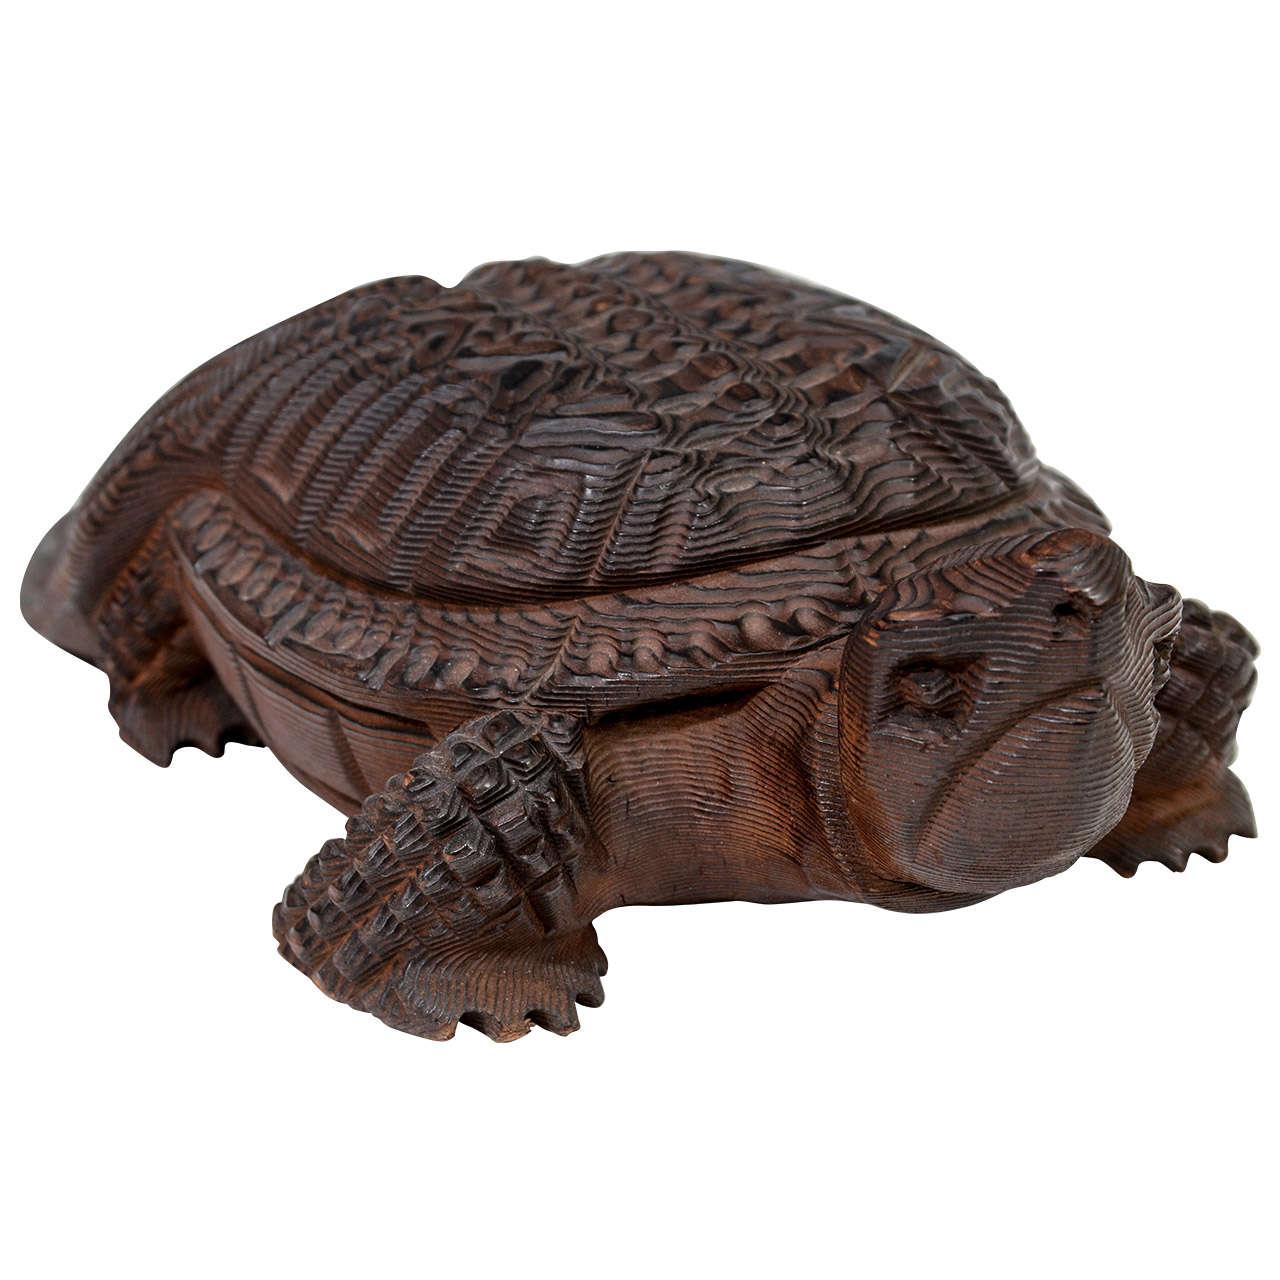 Japanese Meiji Period Carved Large Turtle Okimono